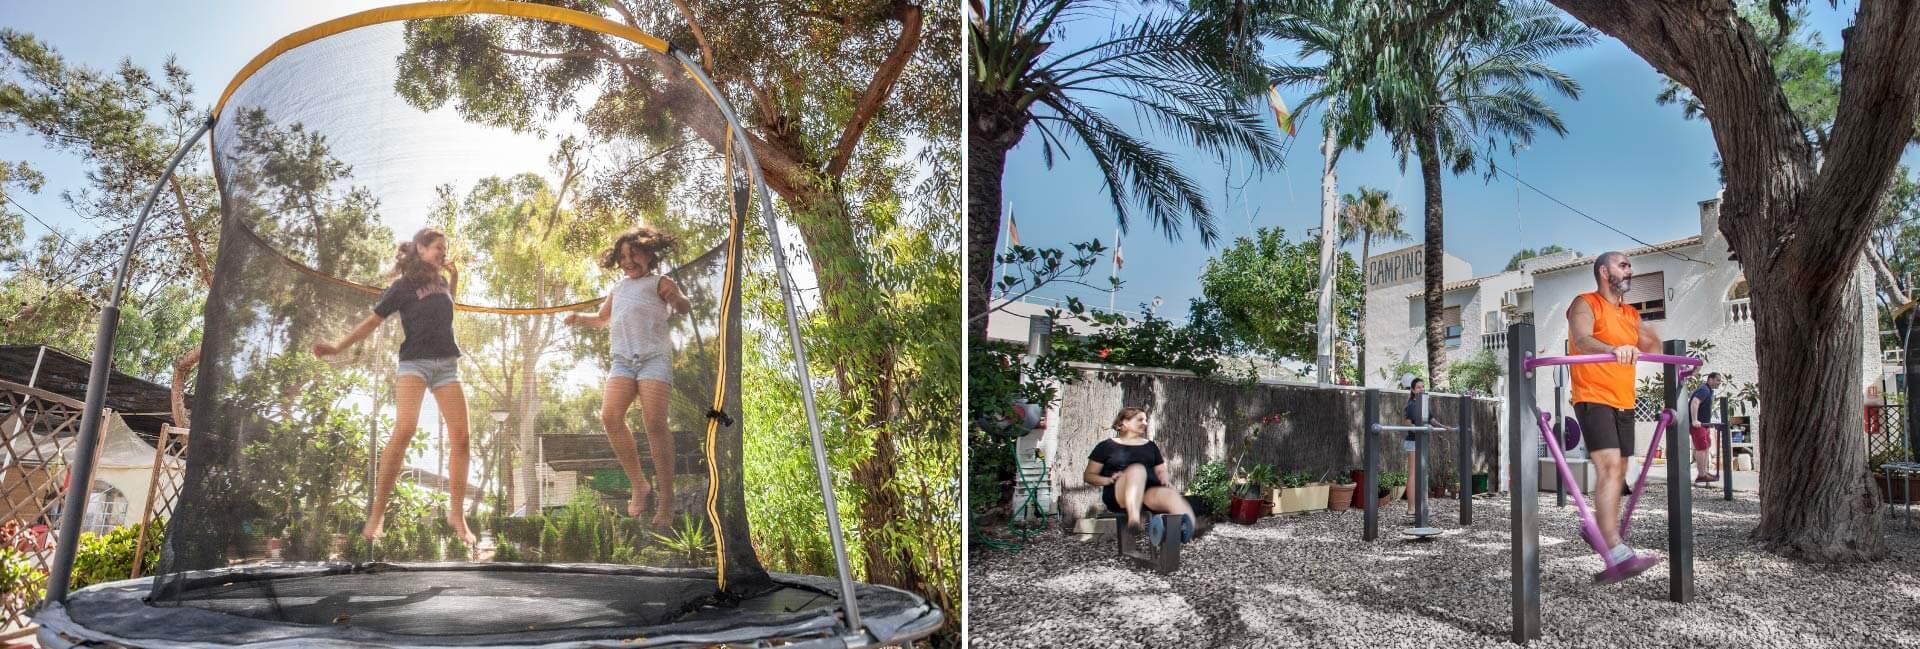 Galeria  Camping Palm Mar